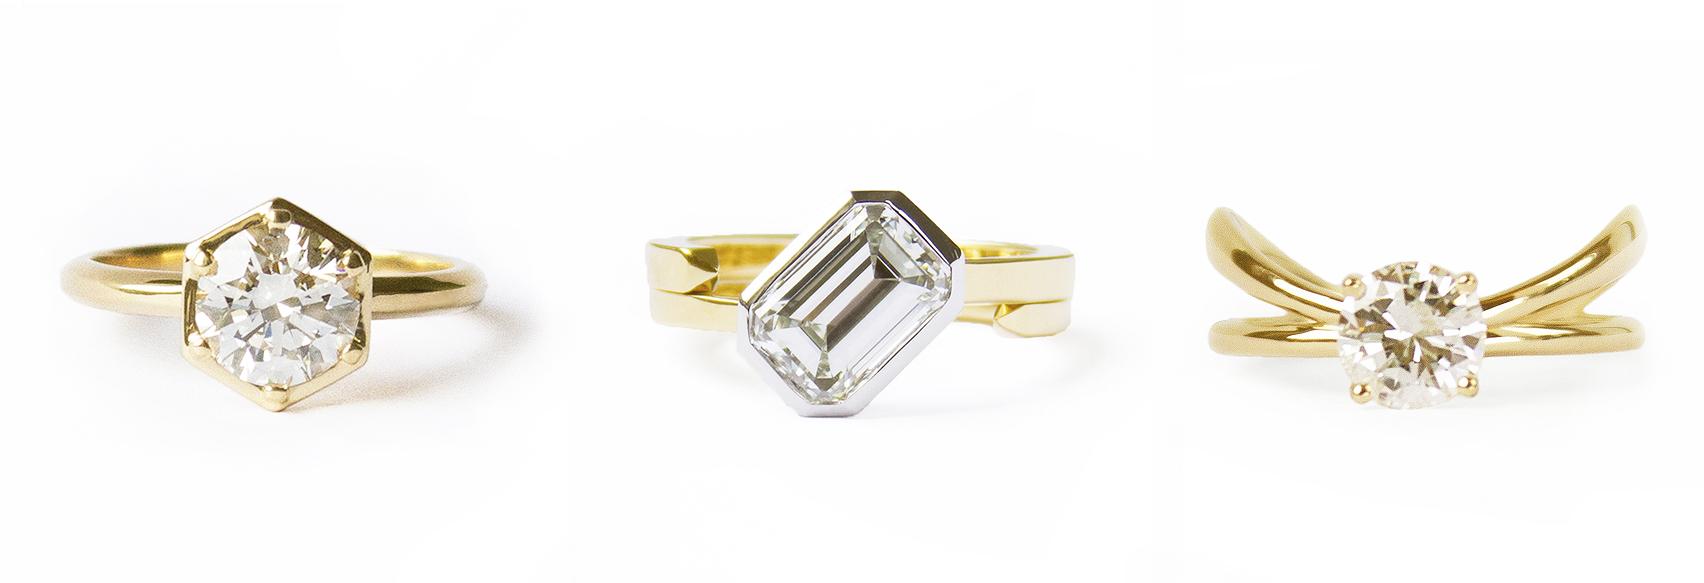 Tilda Biehn NYC Custom Engagement Ring Jewelry.jpg